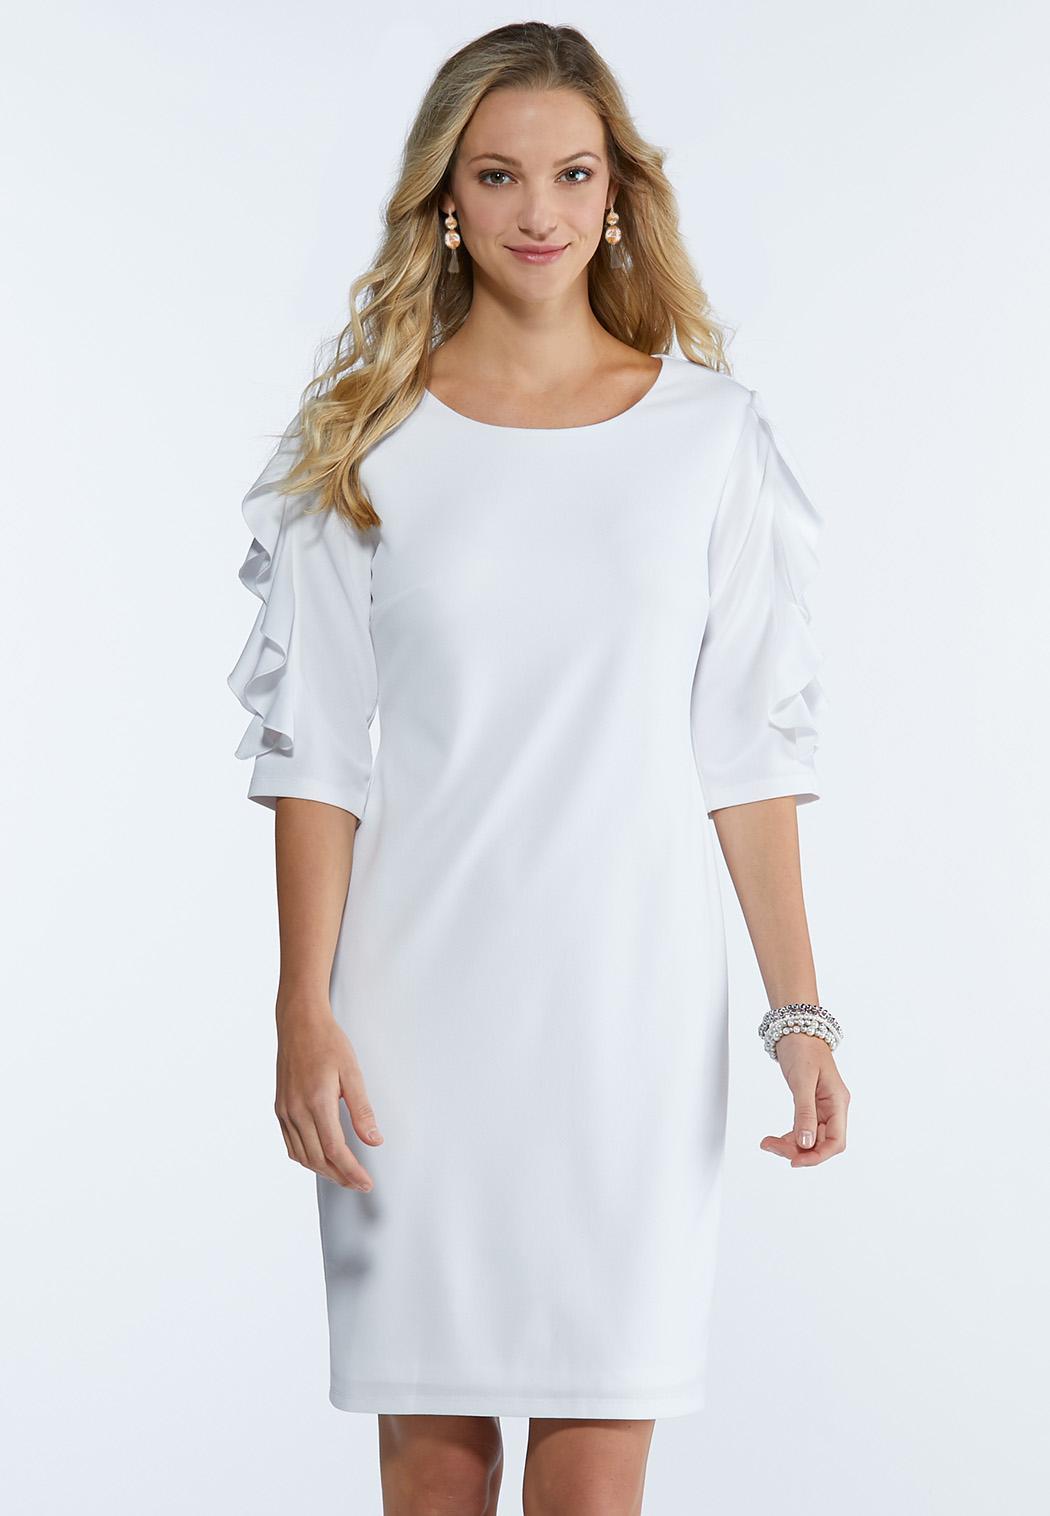 856bab4bcaa Ruffled Lace Sleeve Shift Dress Junior Misses Cato Fashions